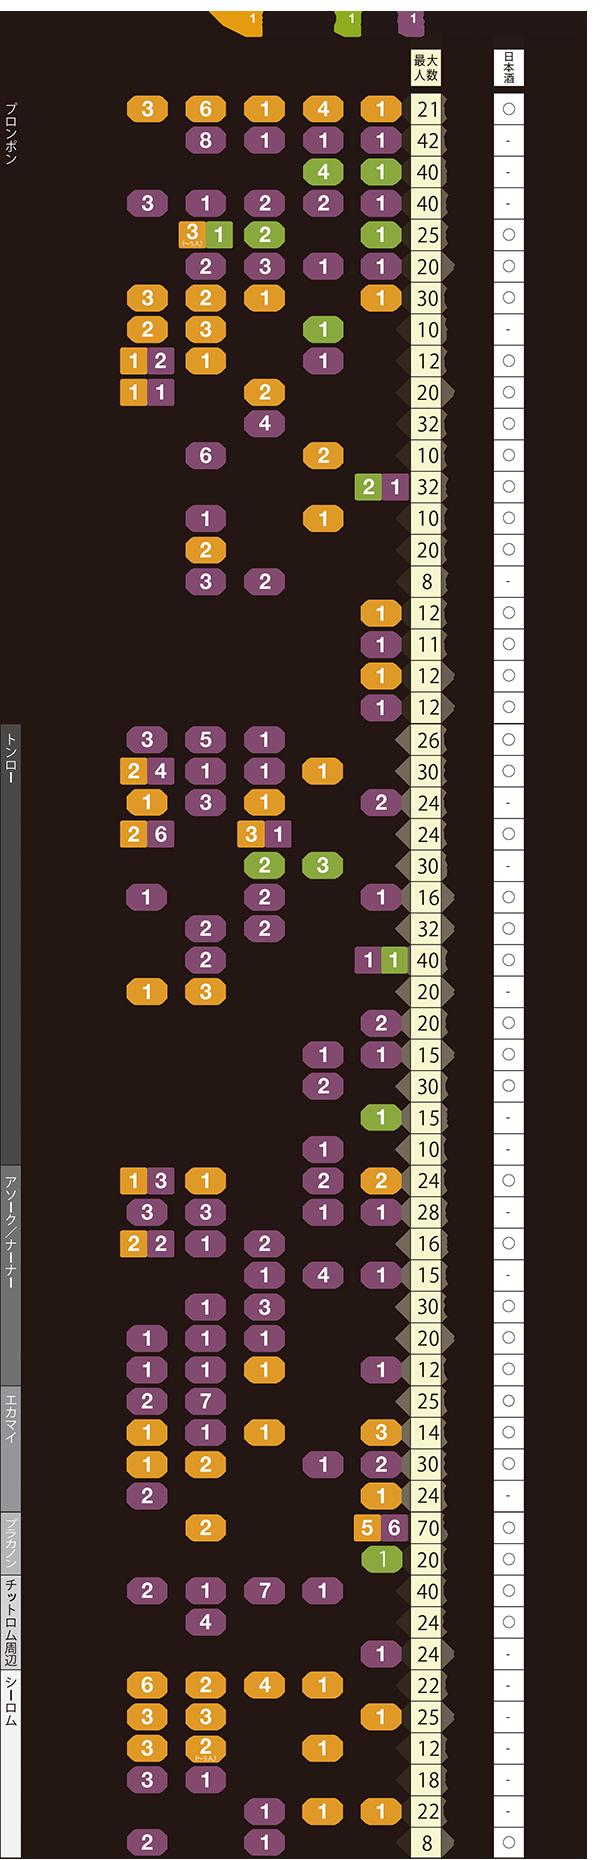 bangmeshi-chart